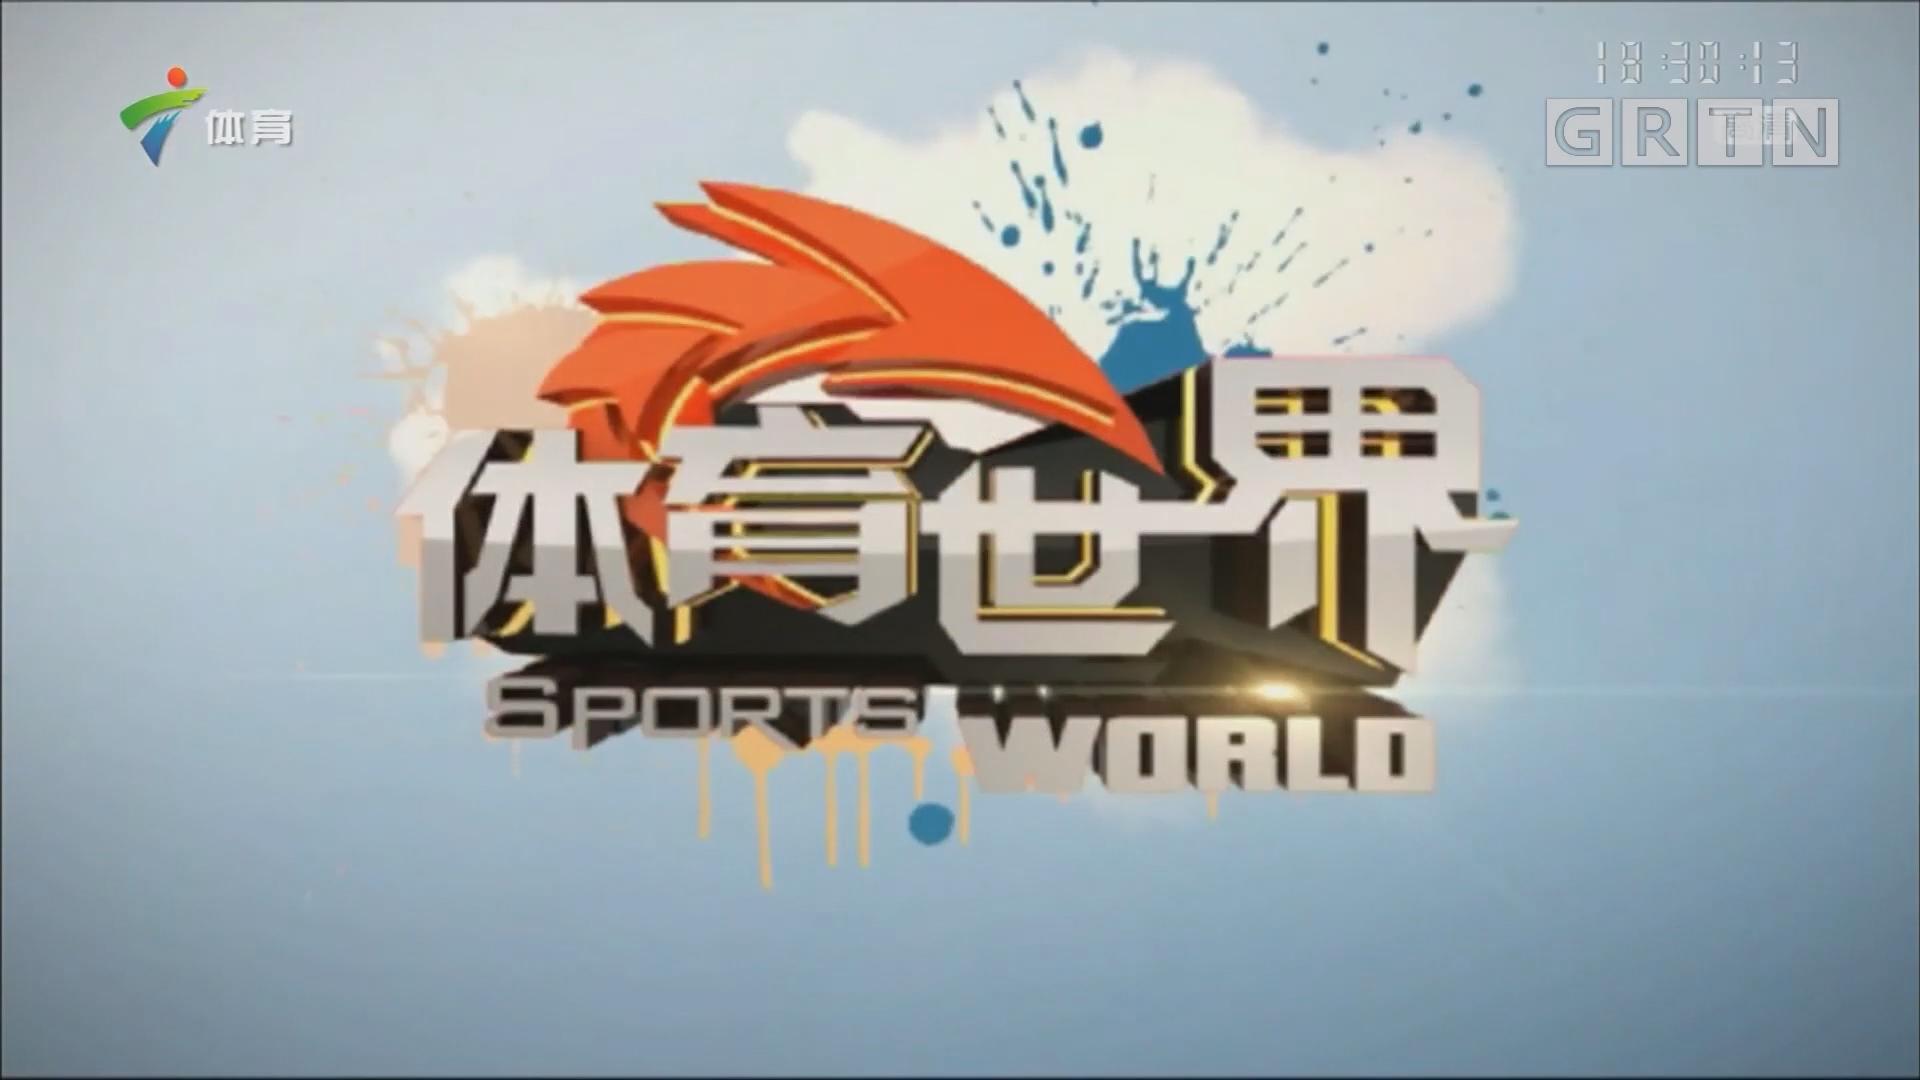 [HD][2017-11-17]体育世界:舌尖上的传承与创新